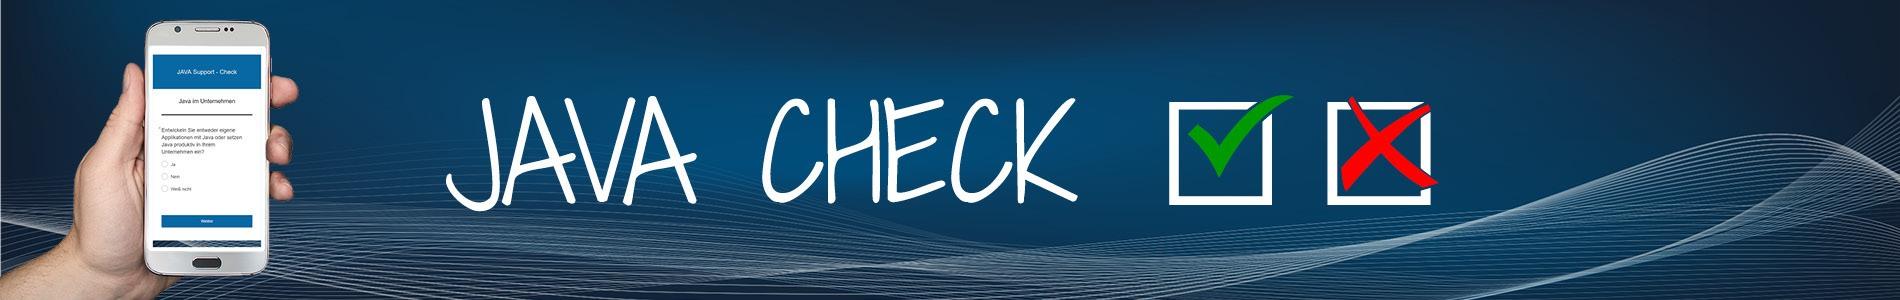 Java check Online